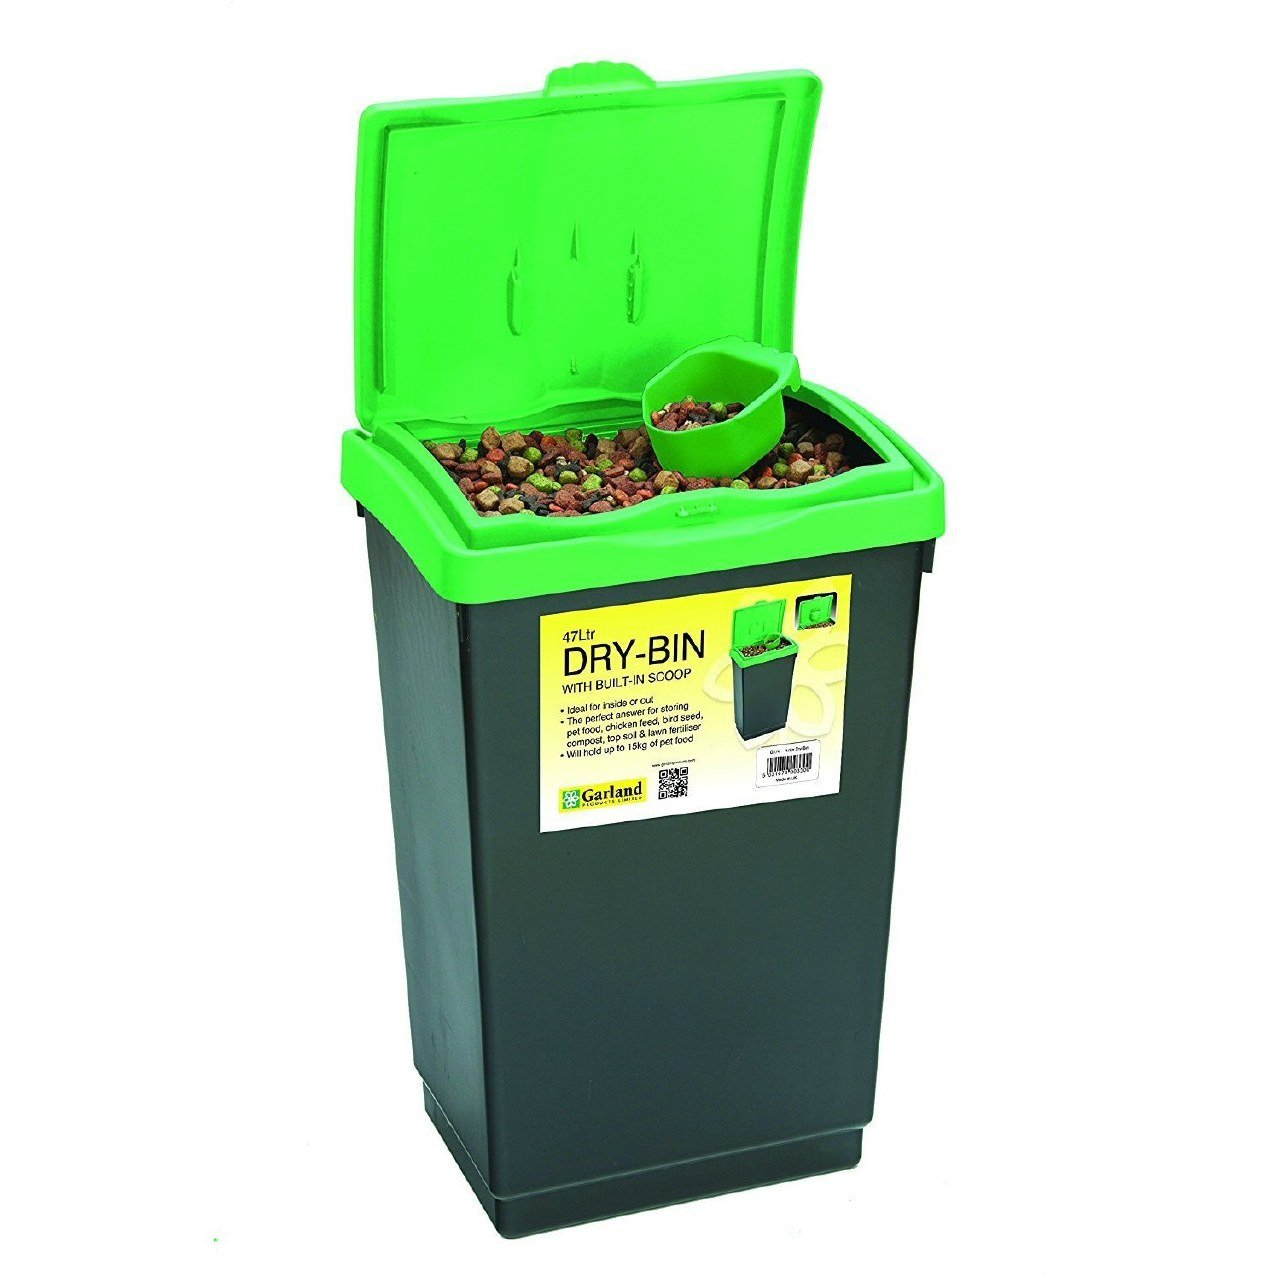 Tierra Garden GP174 Dry-Bin with Lid, 12.5-Gallon